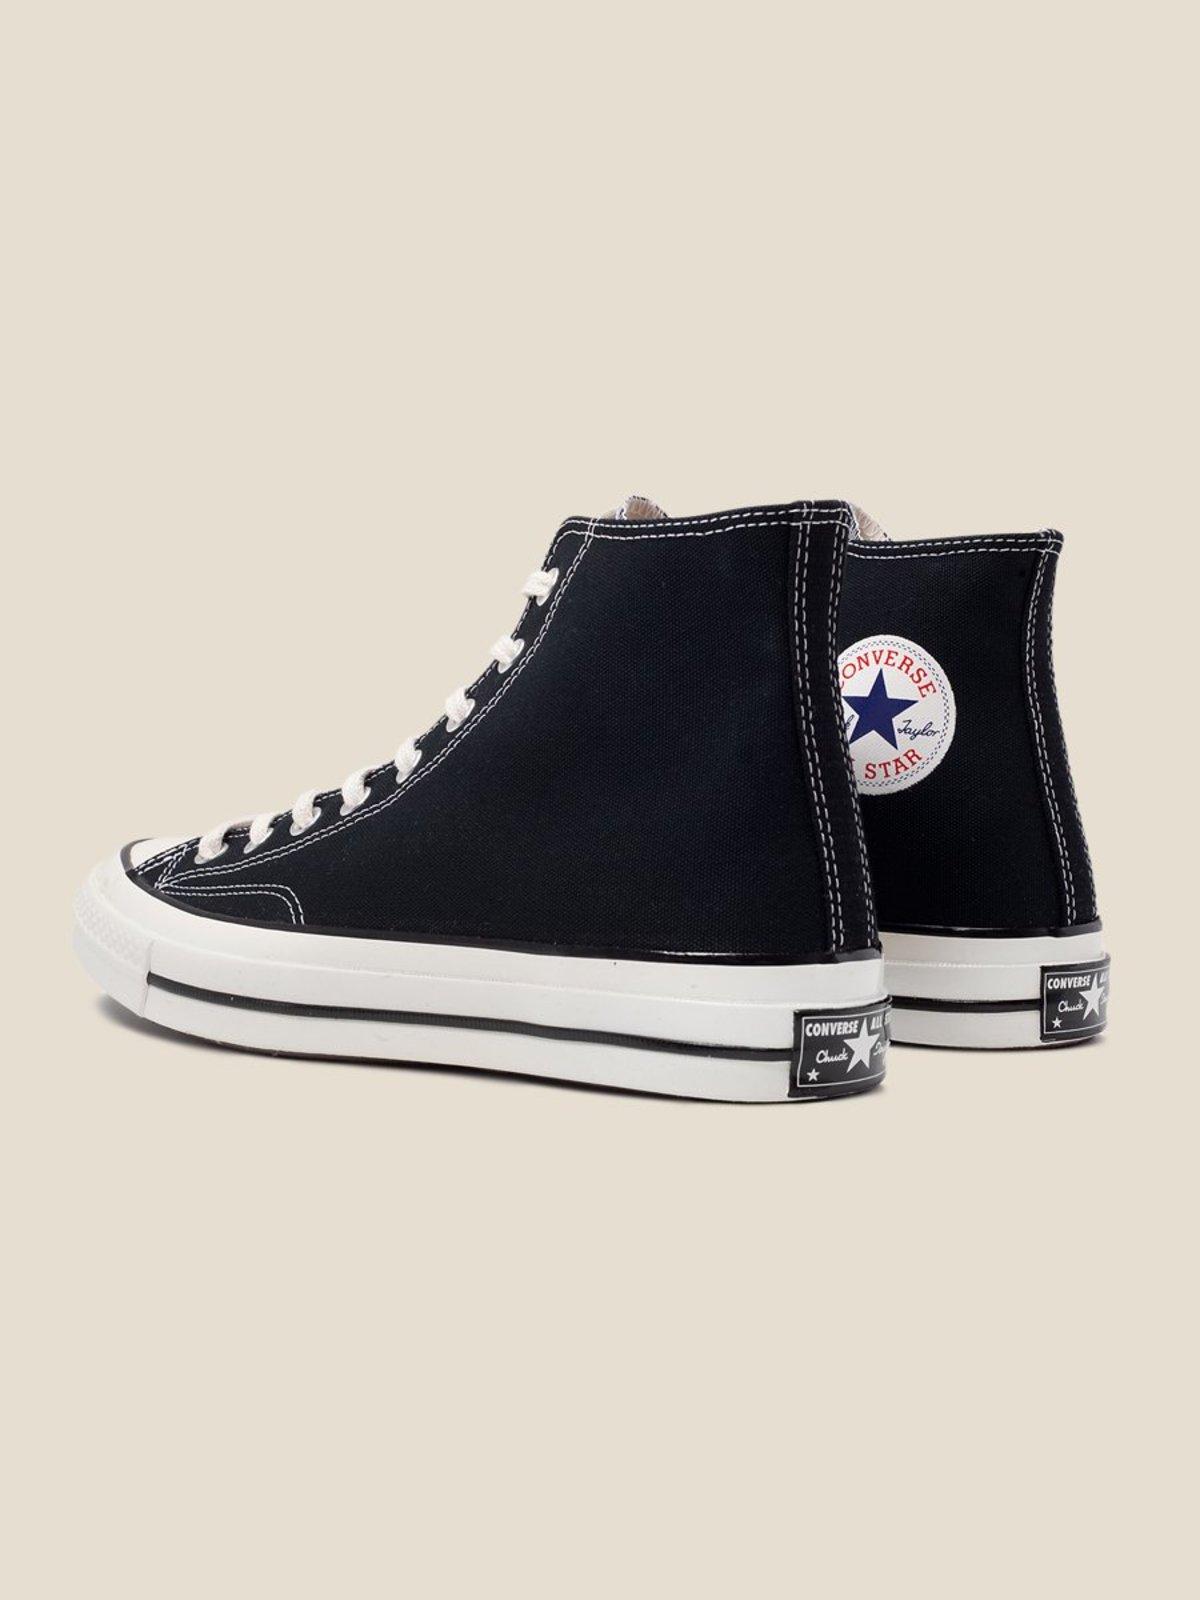 Converse CTAS 70 Hi Sneaker - Black